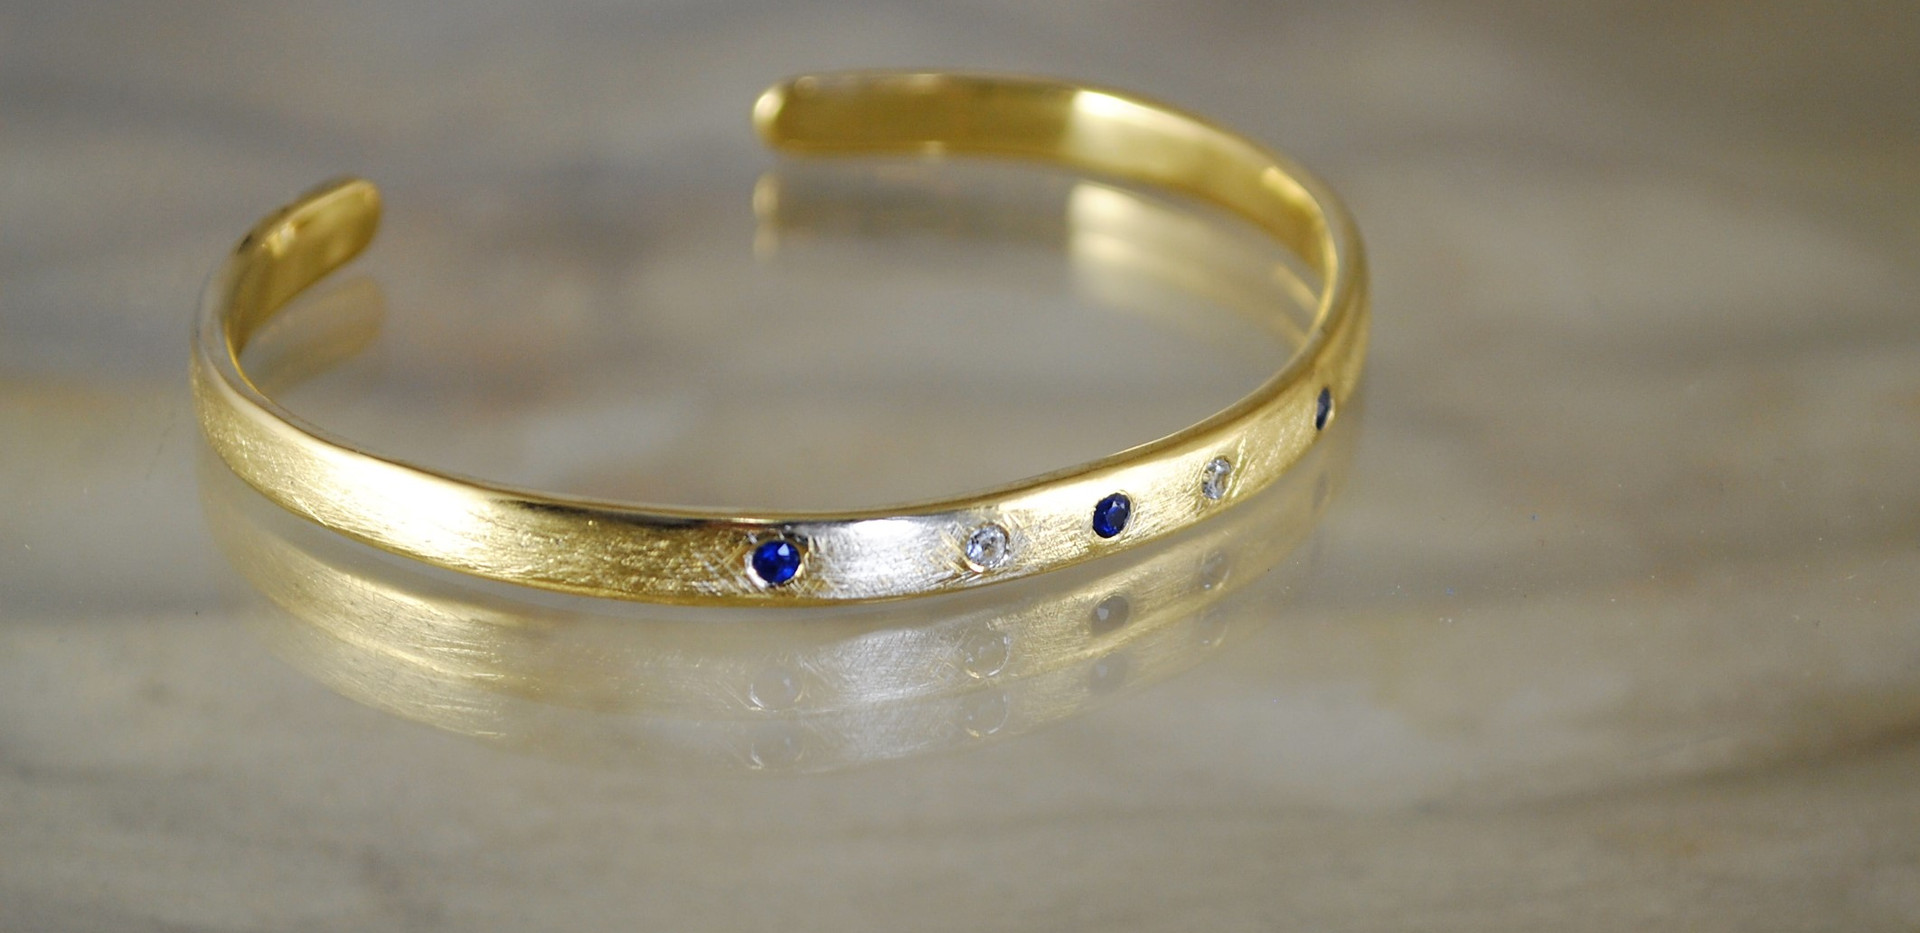 14 carats gold bracelet set with gems.